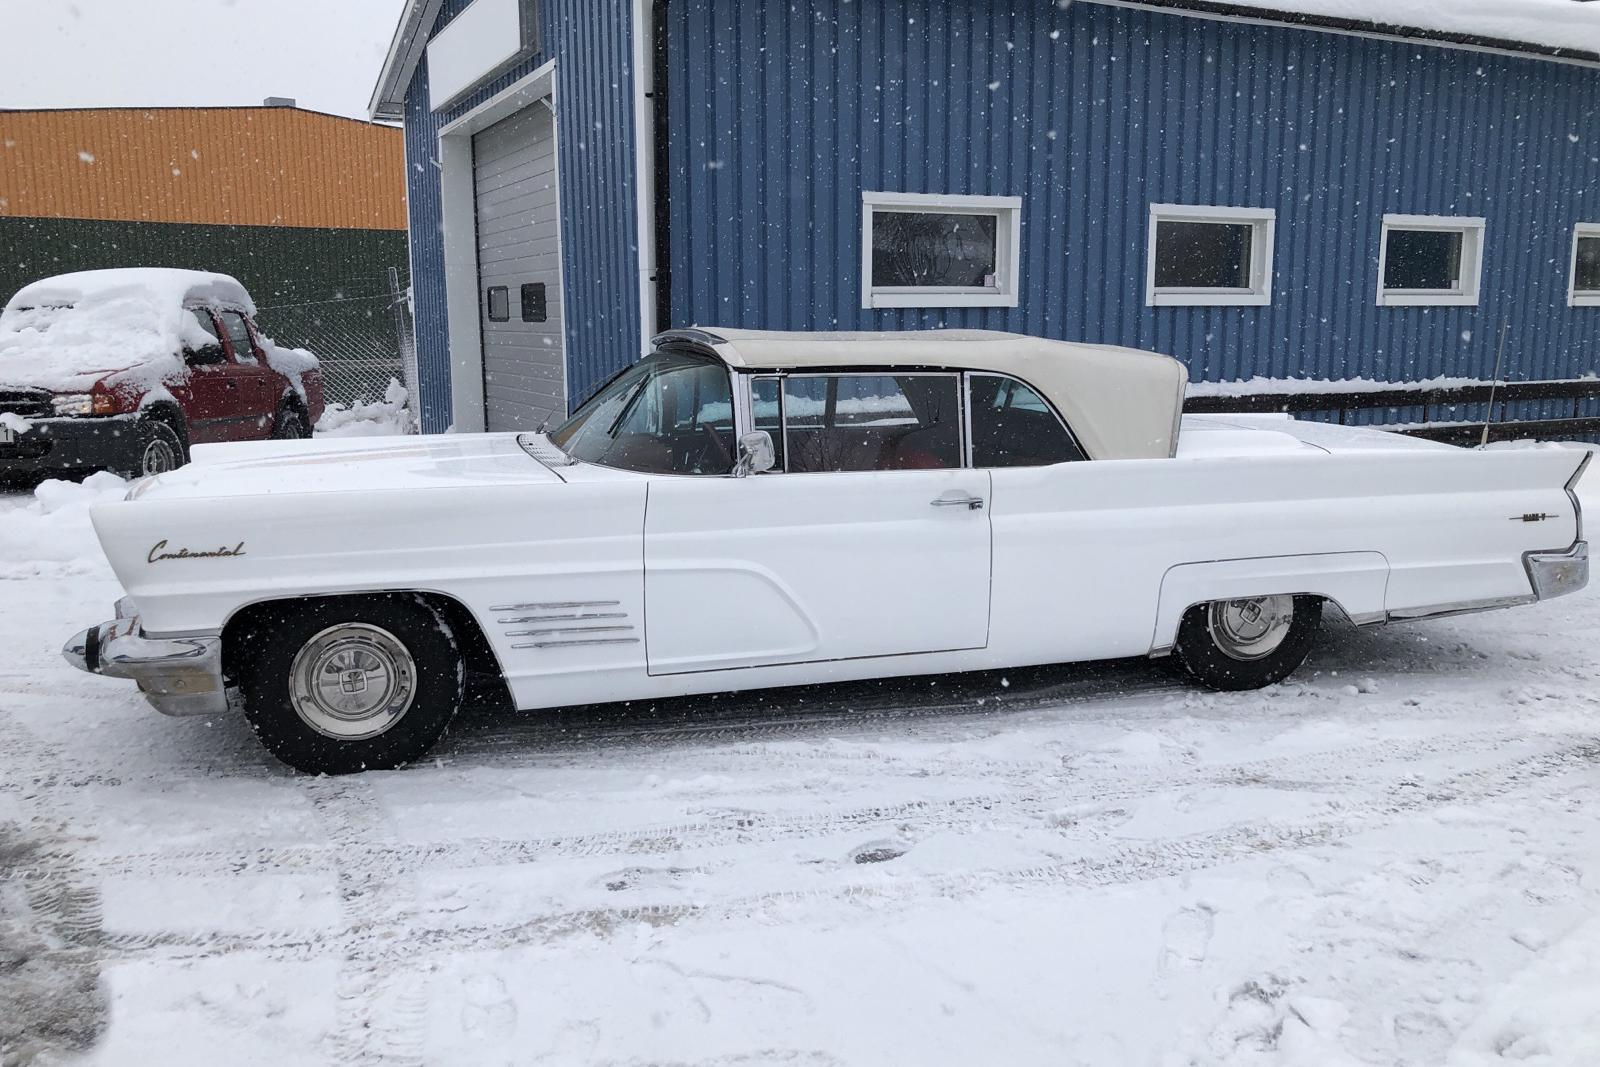 Lincoln Continental Cabriolet 7.0 V8 (319hk) - 84 780 km - Automatic - white - 1960